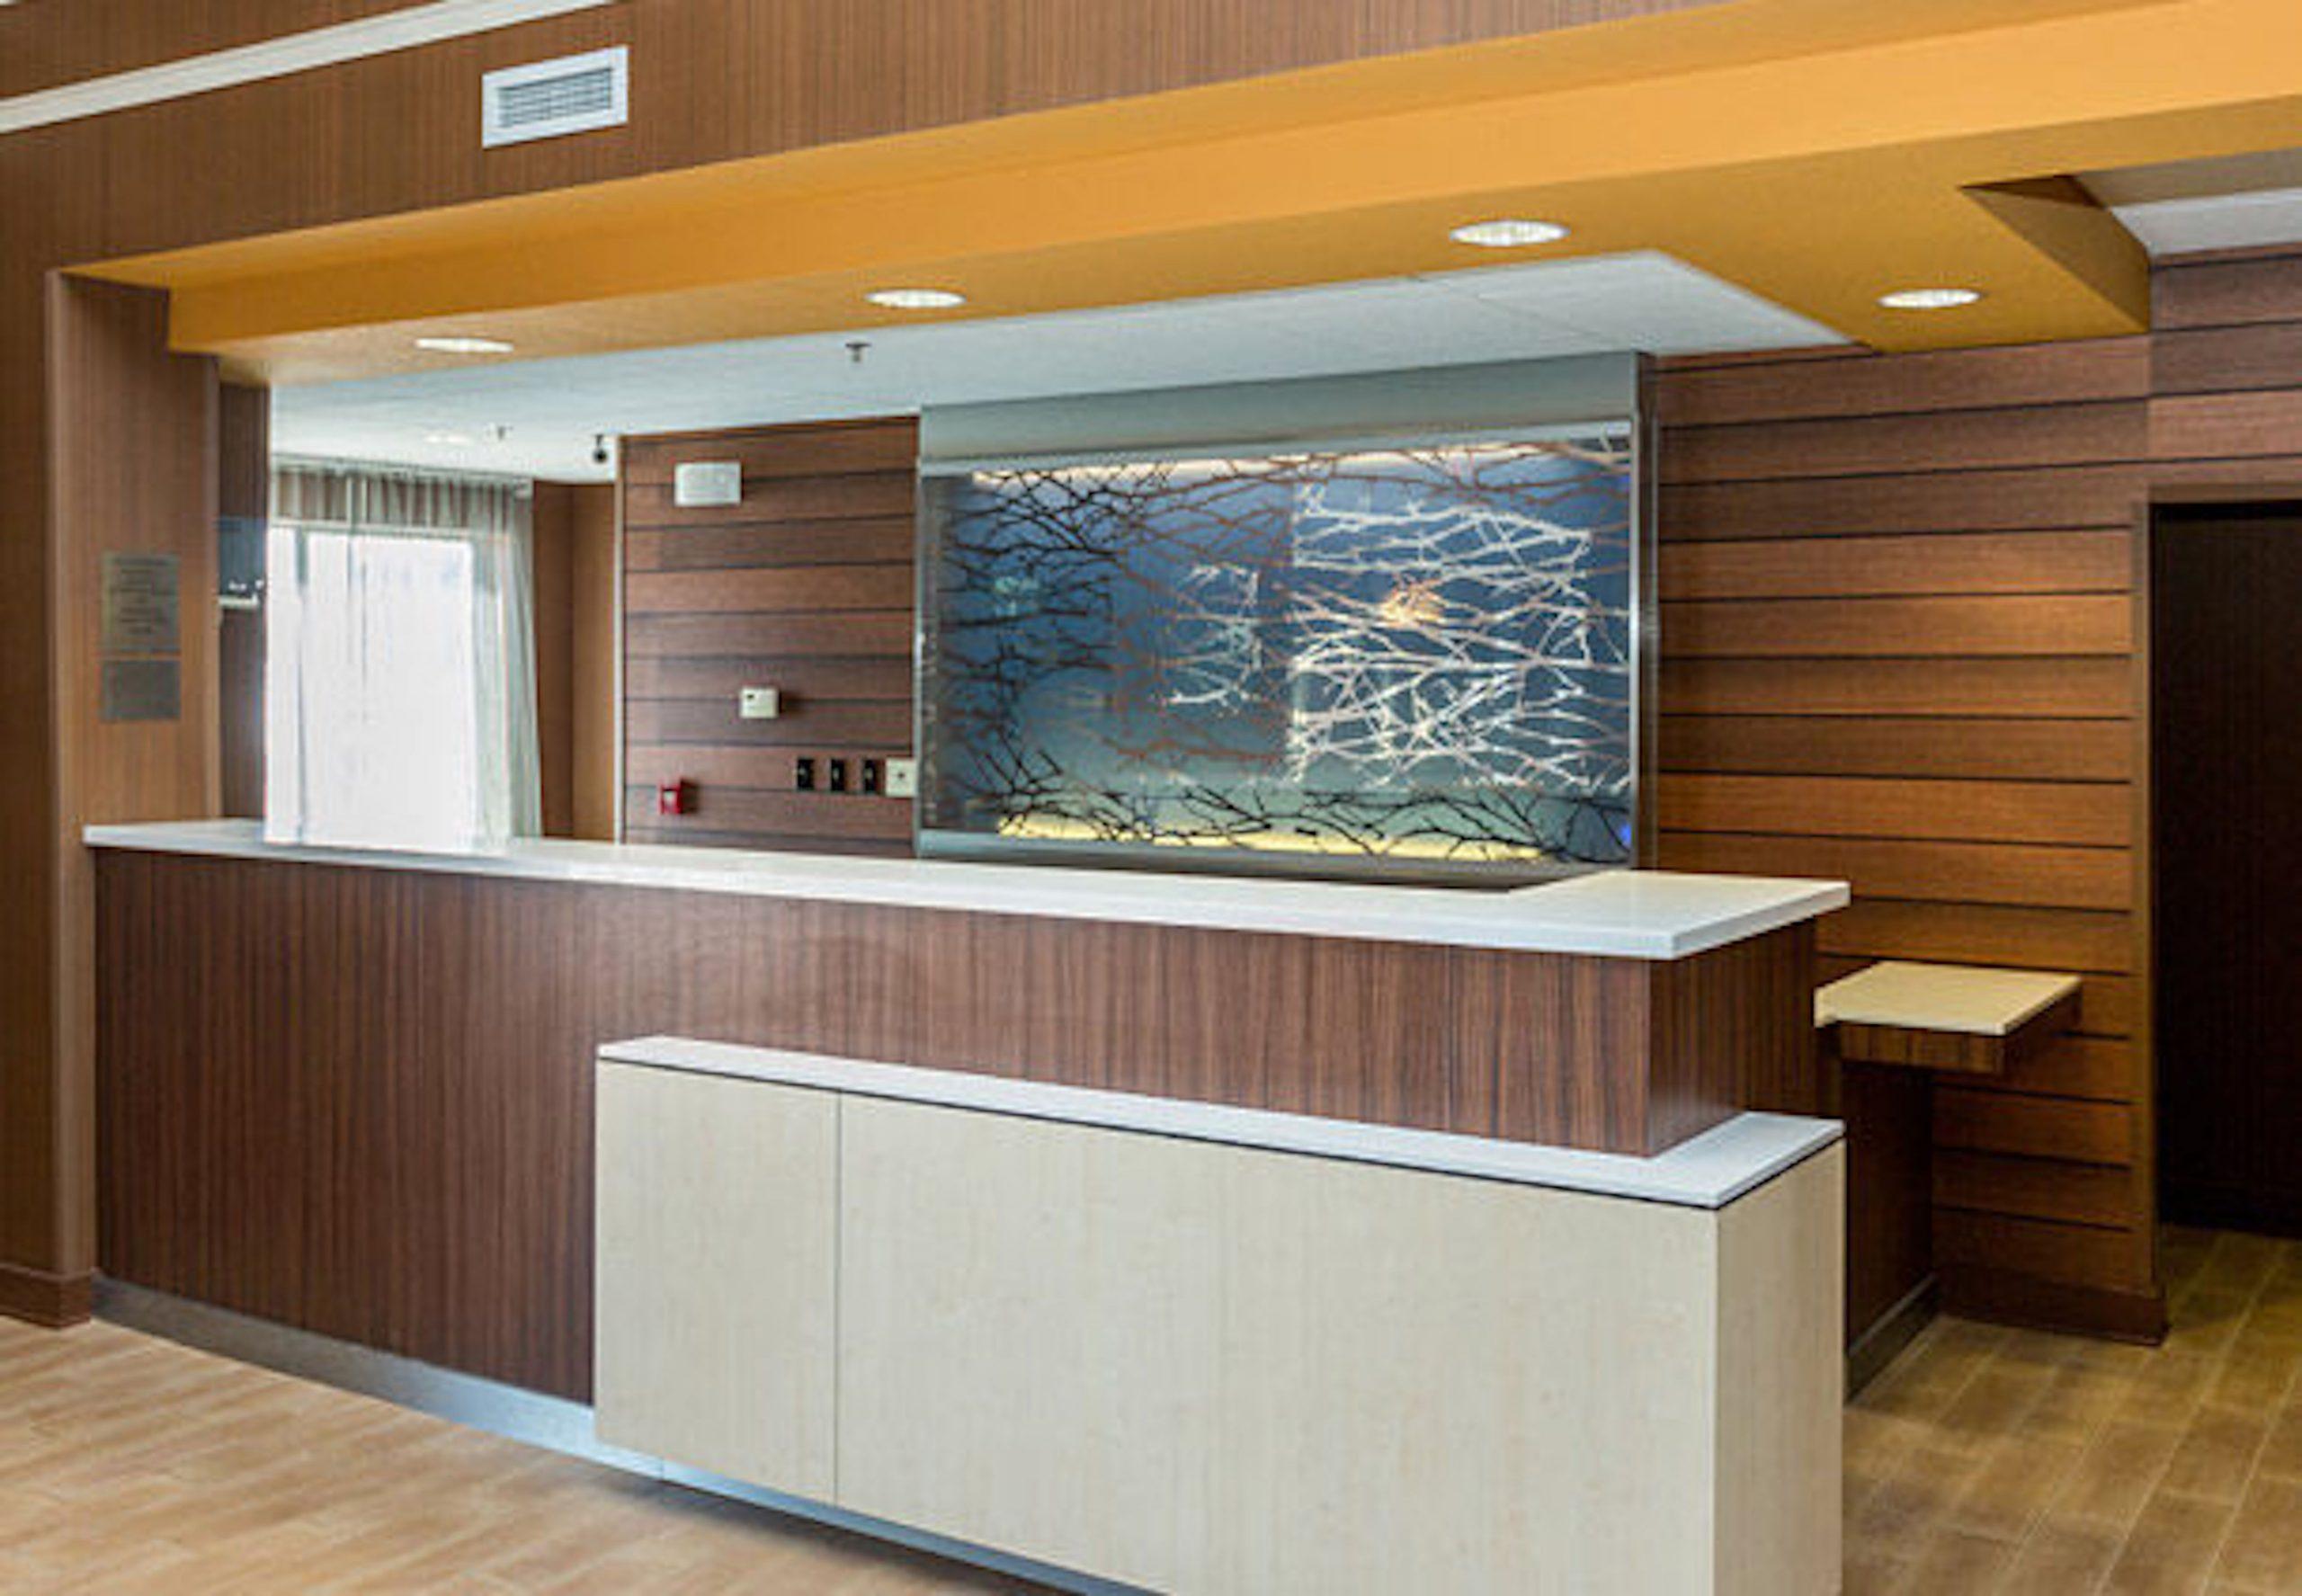 Fairfield Inn & SuFairfield Inn & Suites by Marriott Des Moines West_front Deskites by Marriott Des Moines West_Lobby